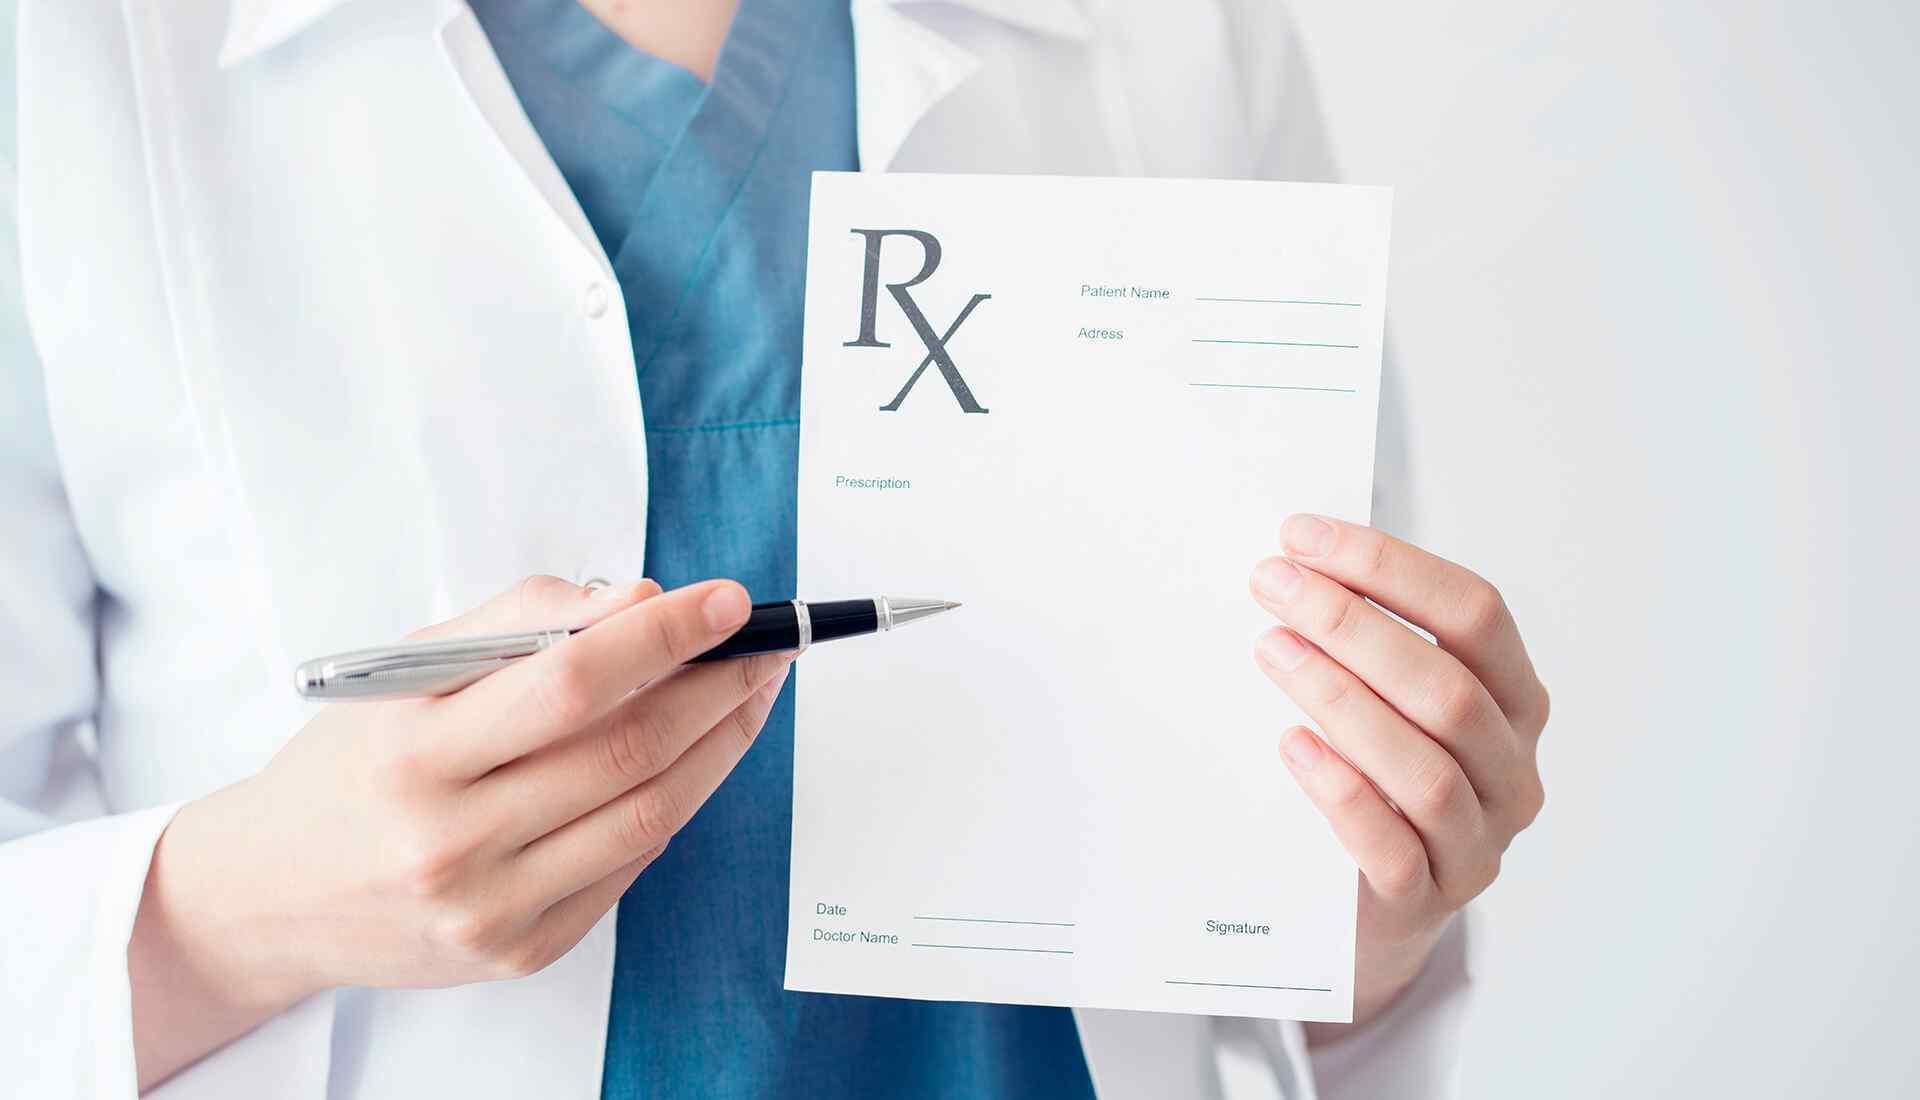 https://www.cannabiscareclinic.com/wp-content/uploads/2019/01/medical-marijuana-card-by-cannabis-care-clinic.jpg